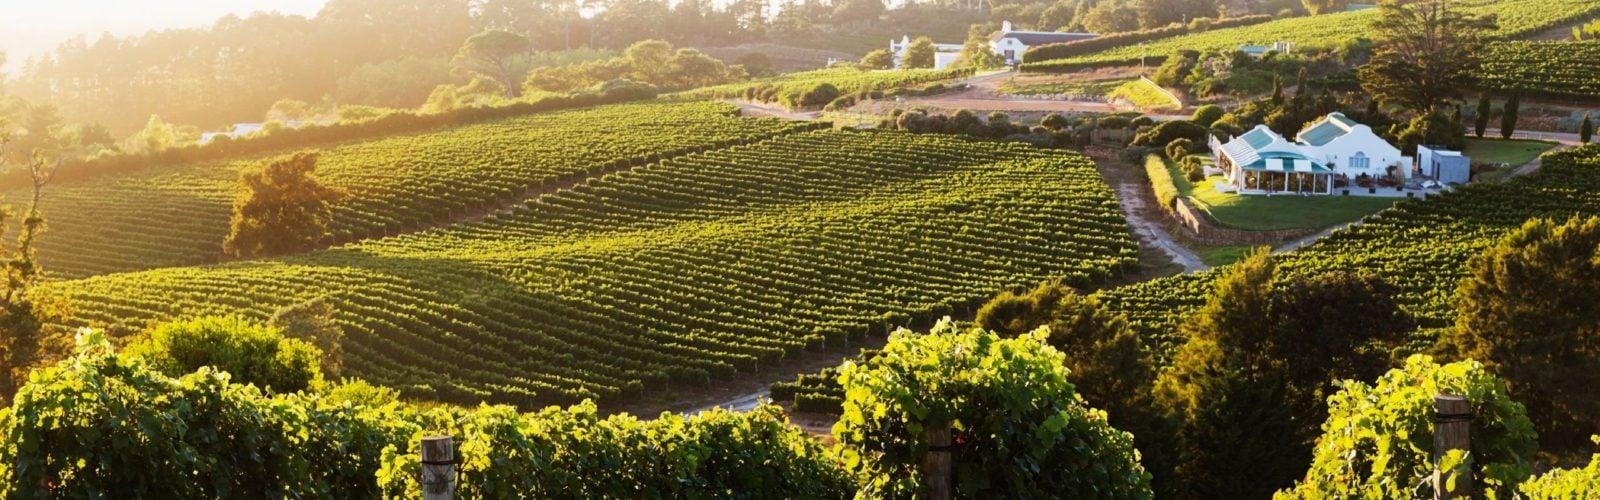 Constantia Winelands South Africa